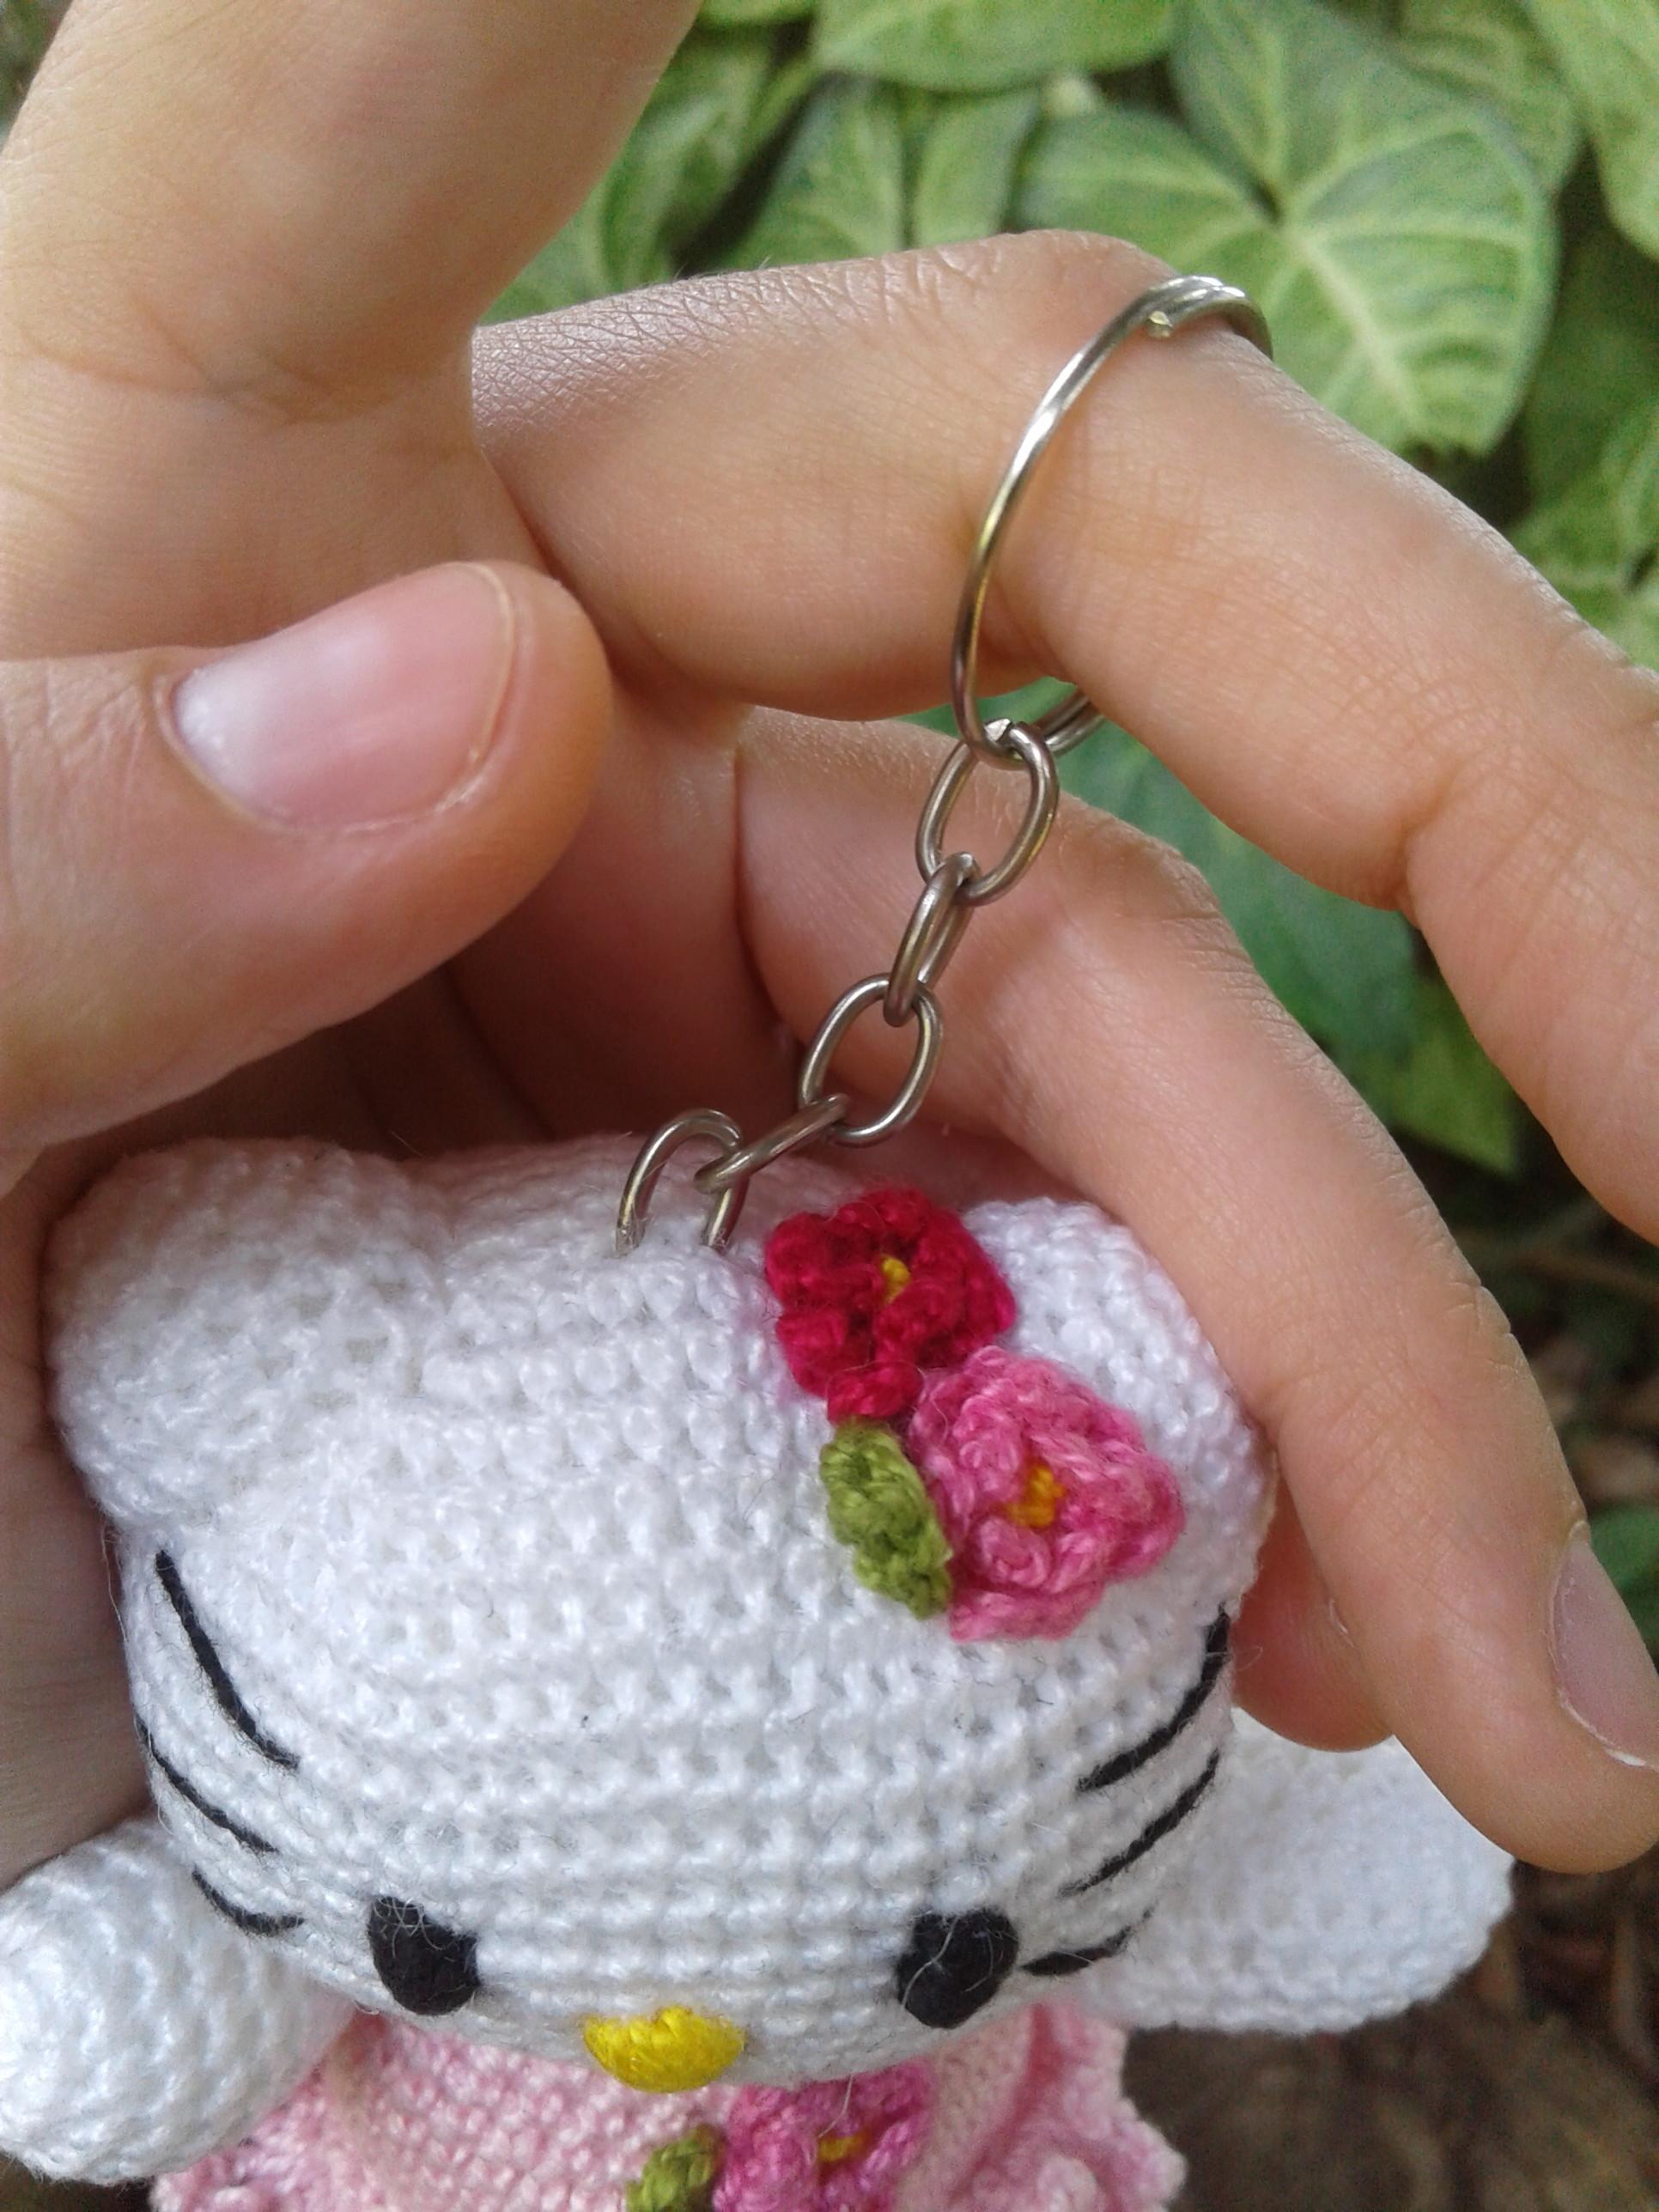 Crochet Amigurumi Cat Free Patterns | Hello kitty crochet, Crochet ... | 2576x1932